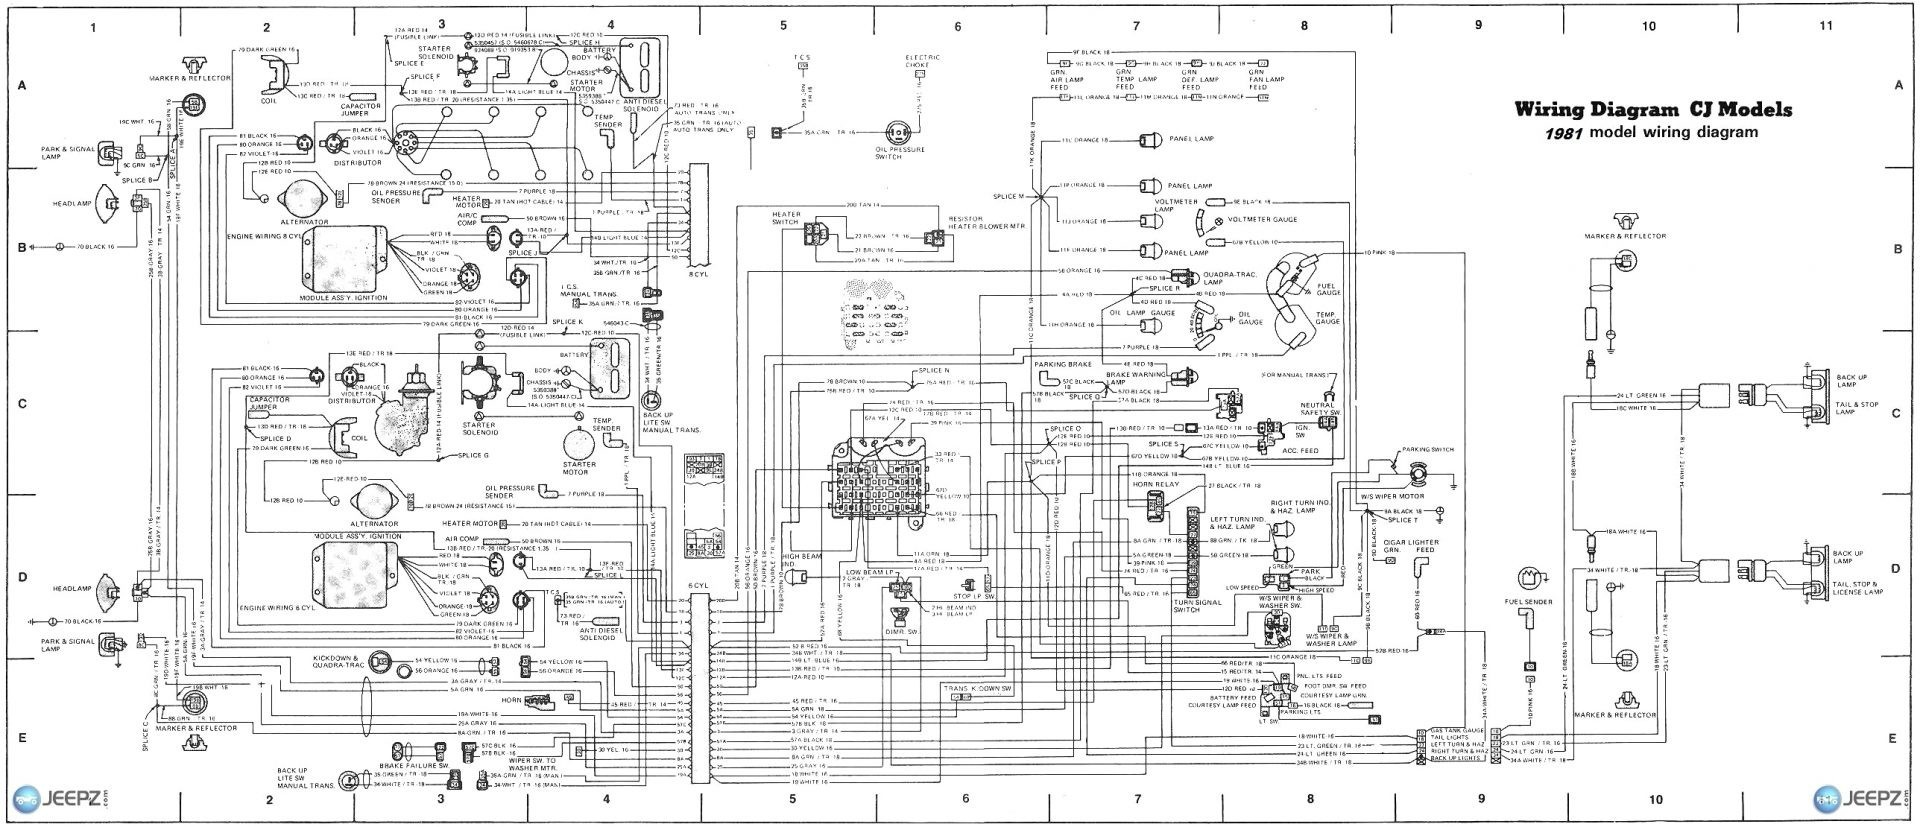 Clark C30l Wiring Diagram Clark Gcx30e Wiring Diagram Wiring Diagram Of Clark C30l Wiring Diagram